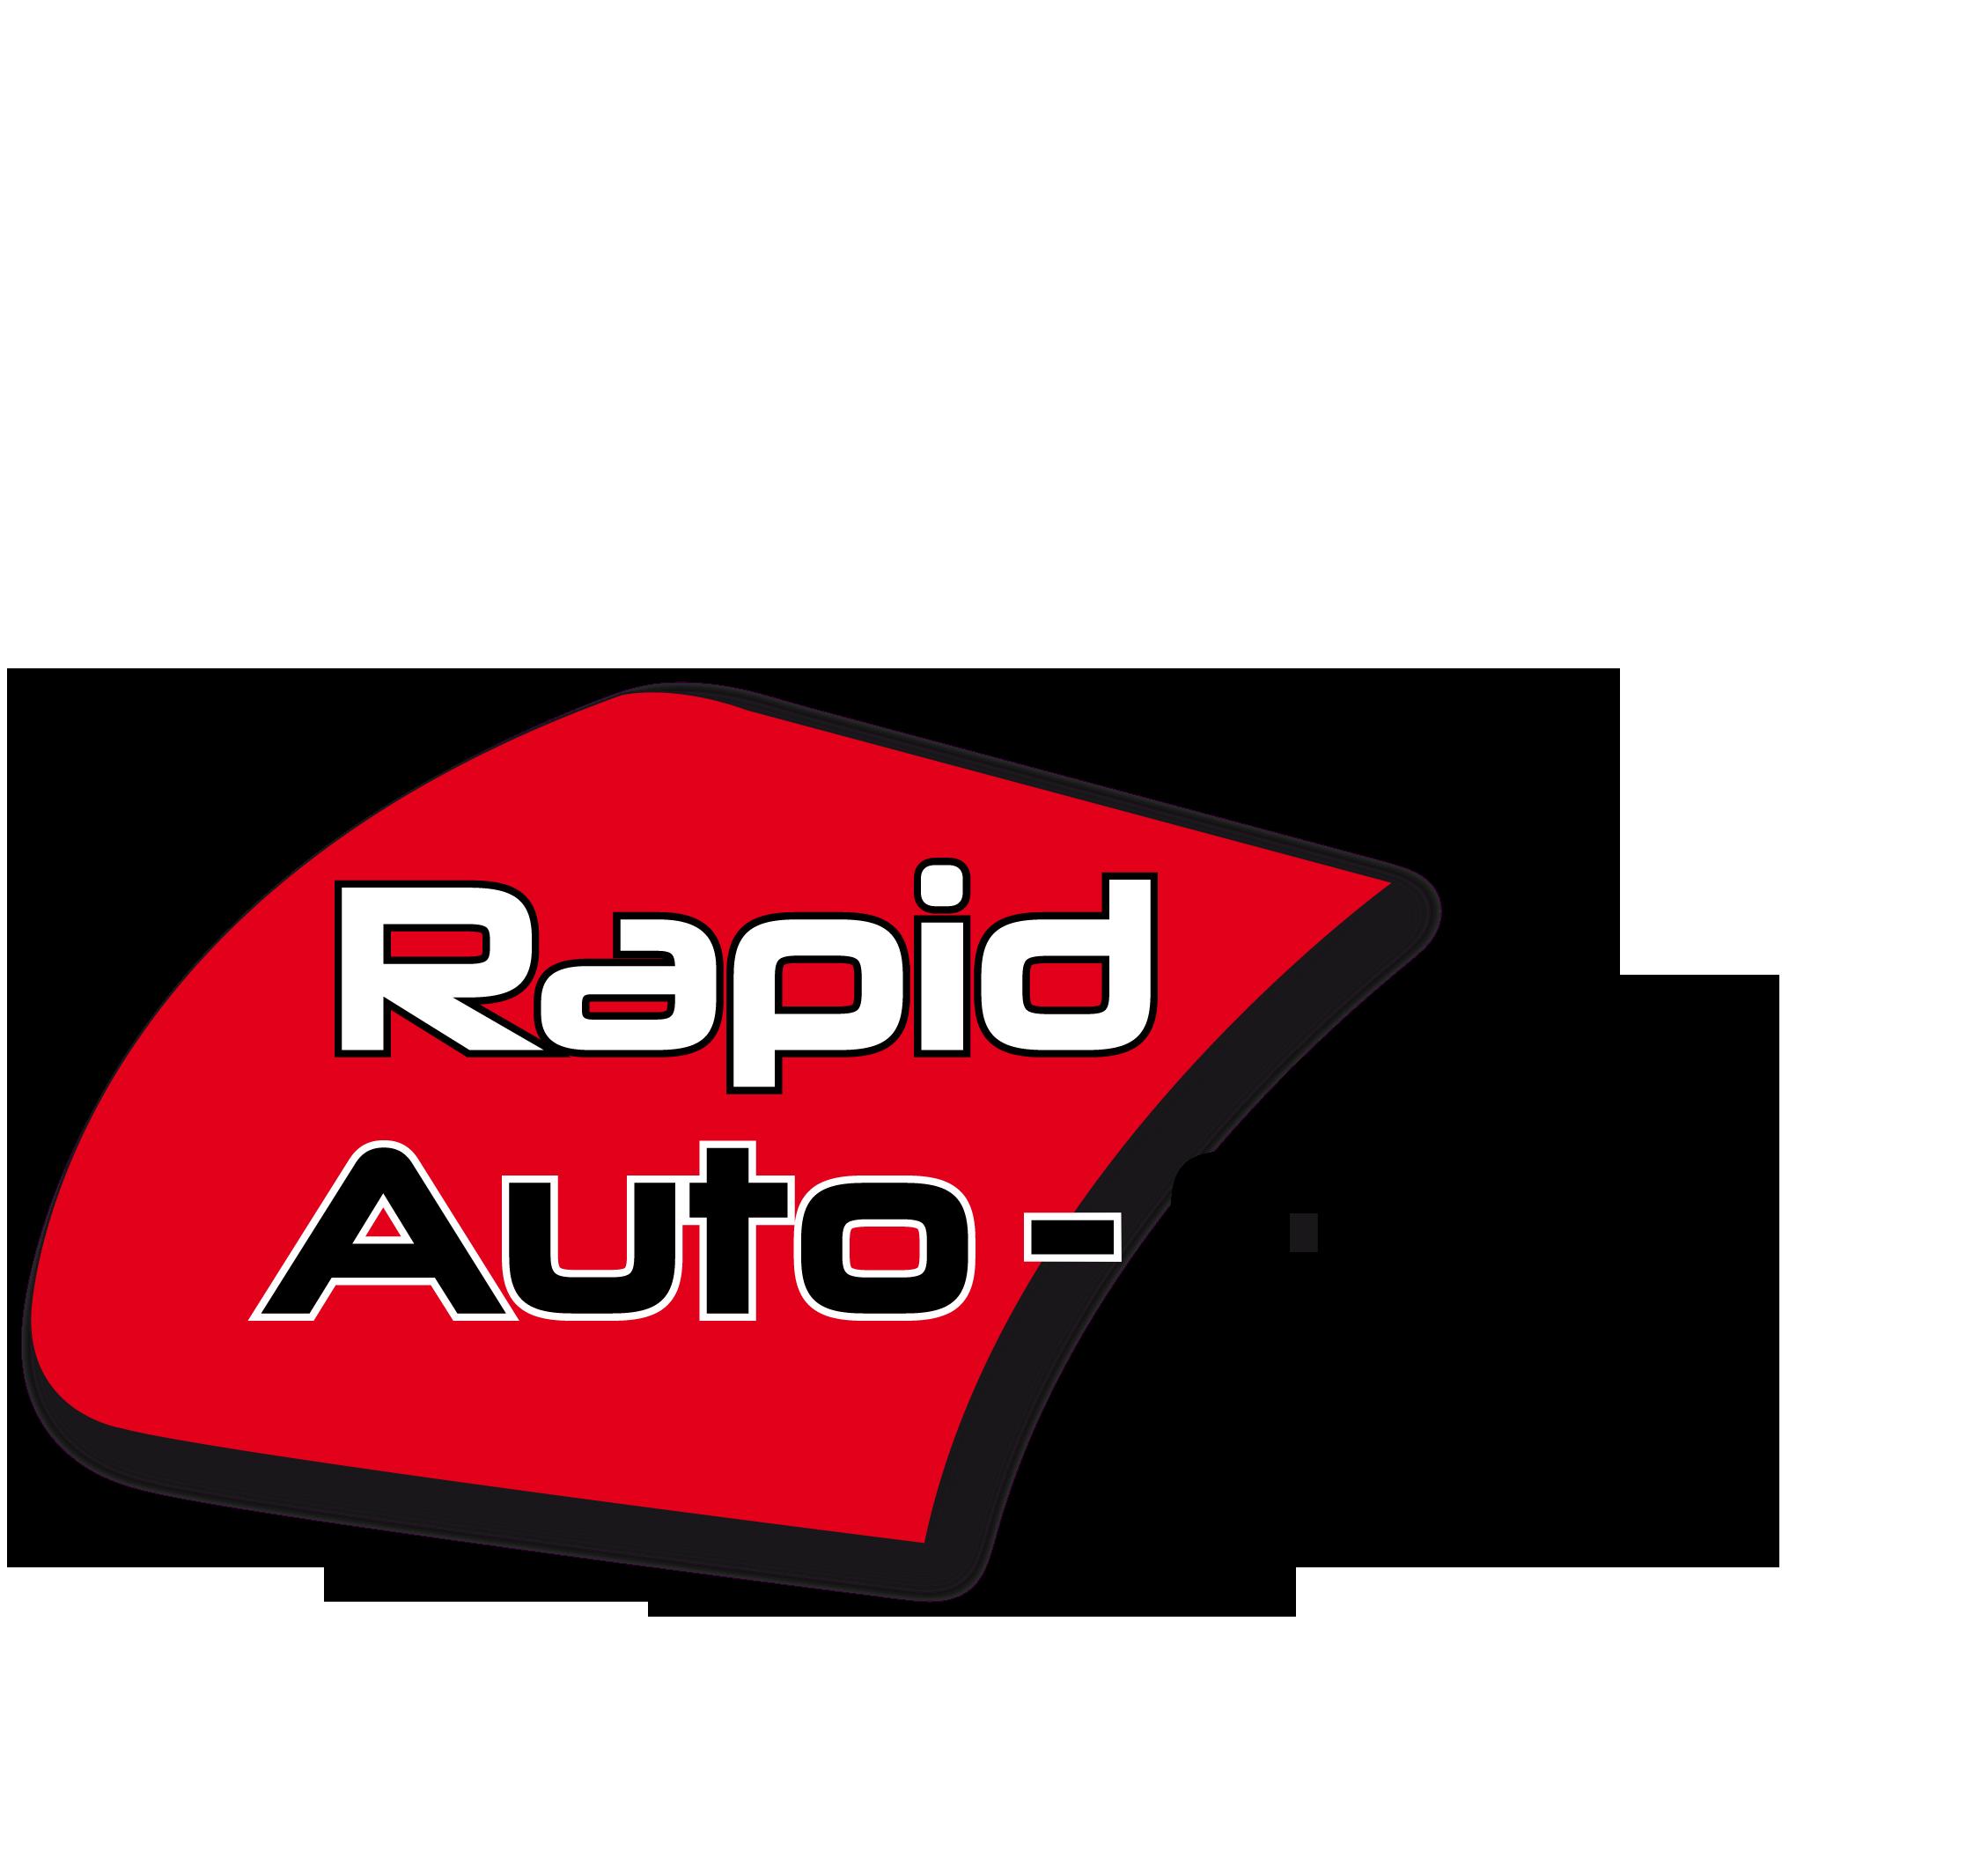 Rapid Auto Glas